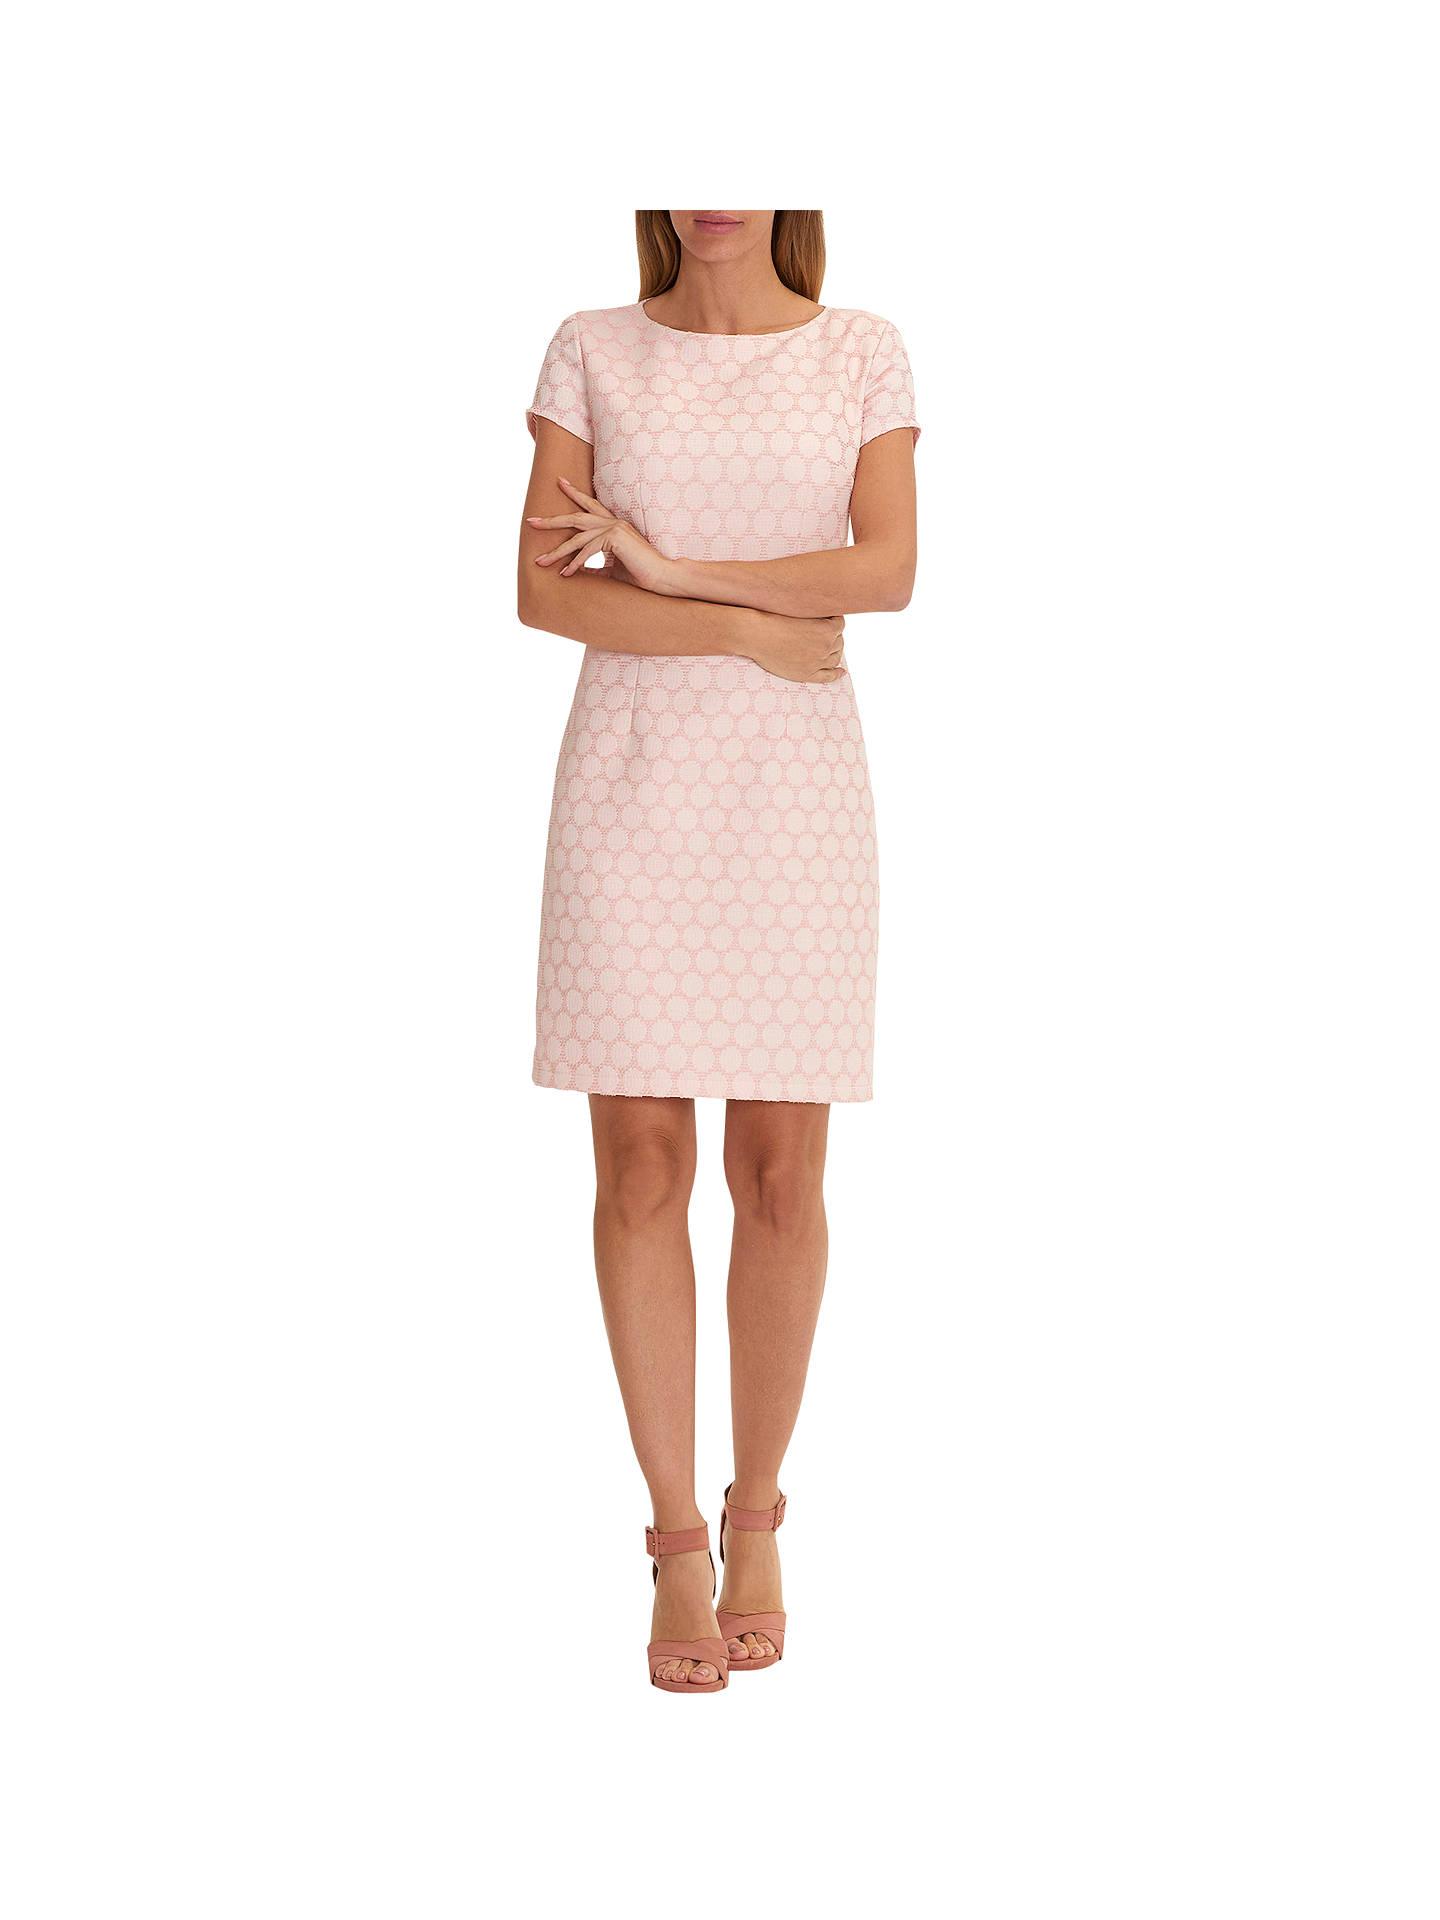 566e8a2361 Buy Betty Barclay Textured Shift Dress